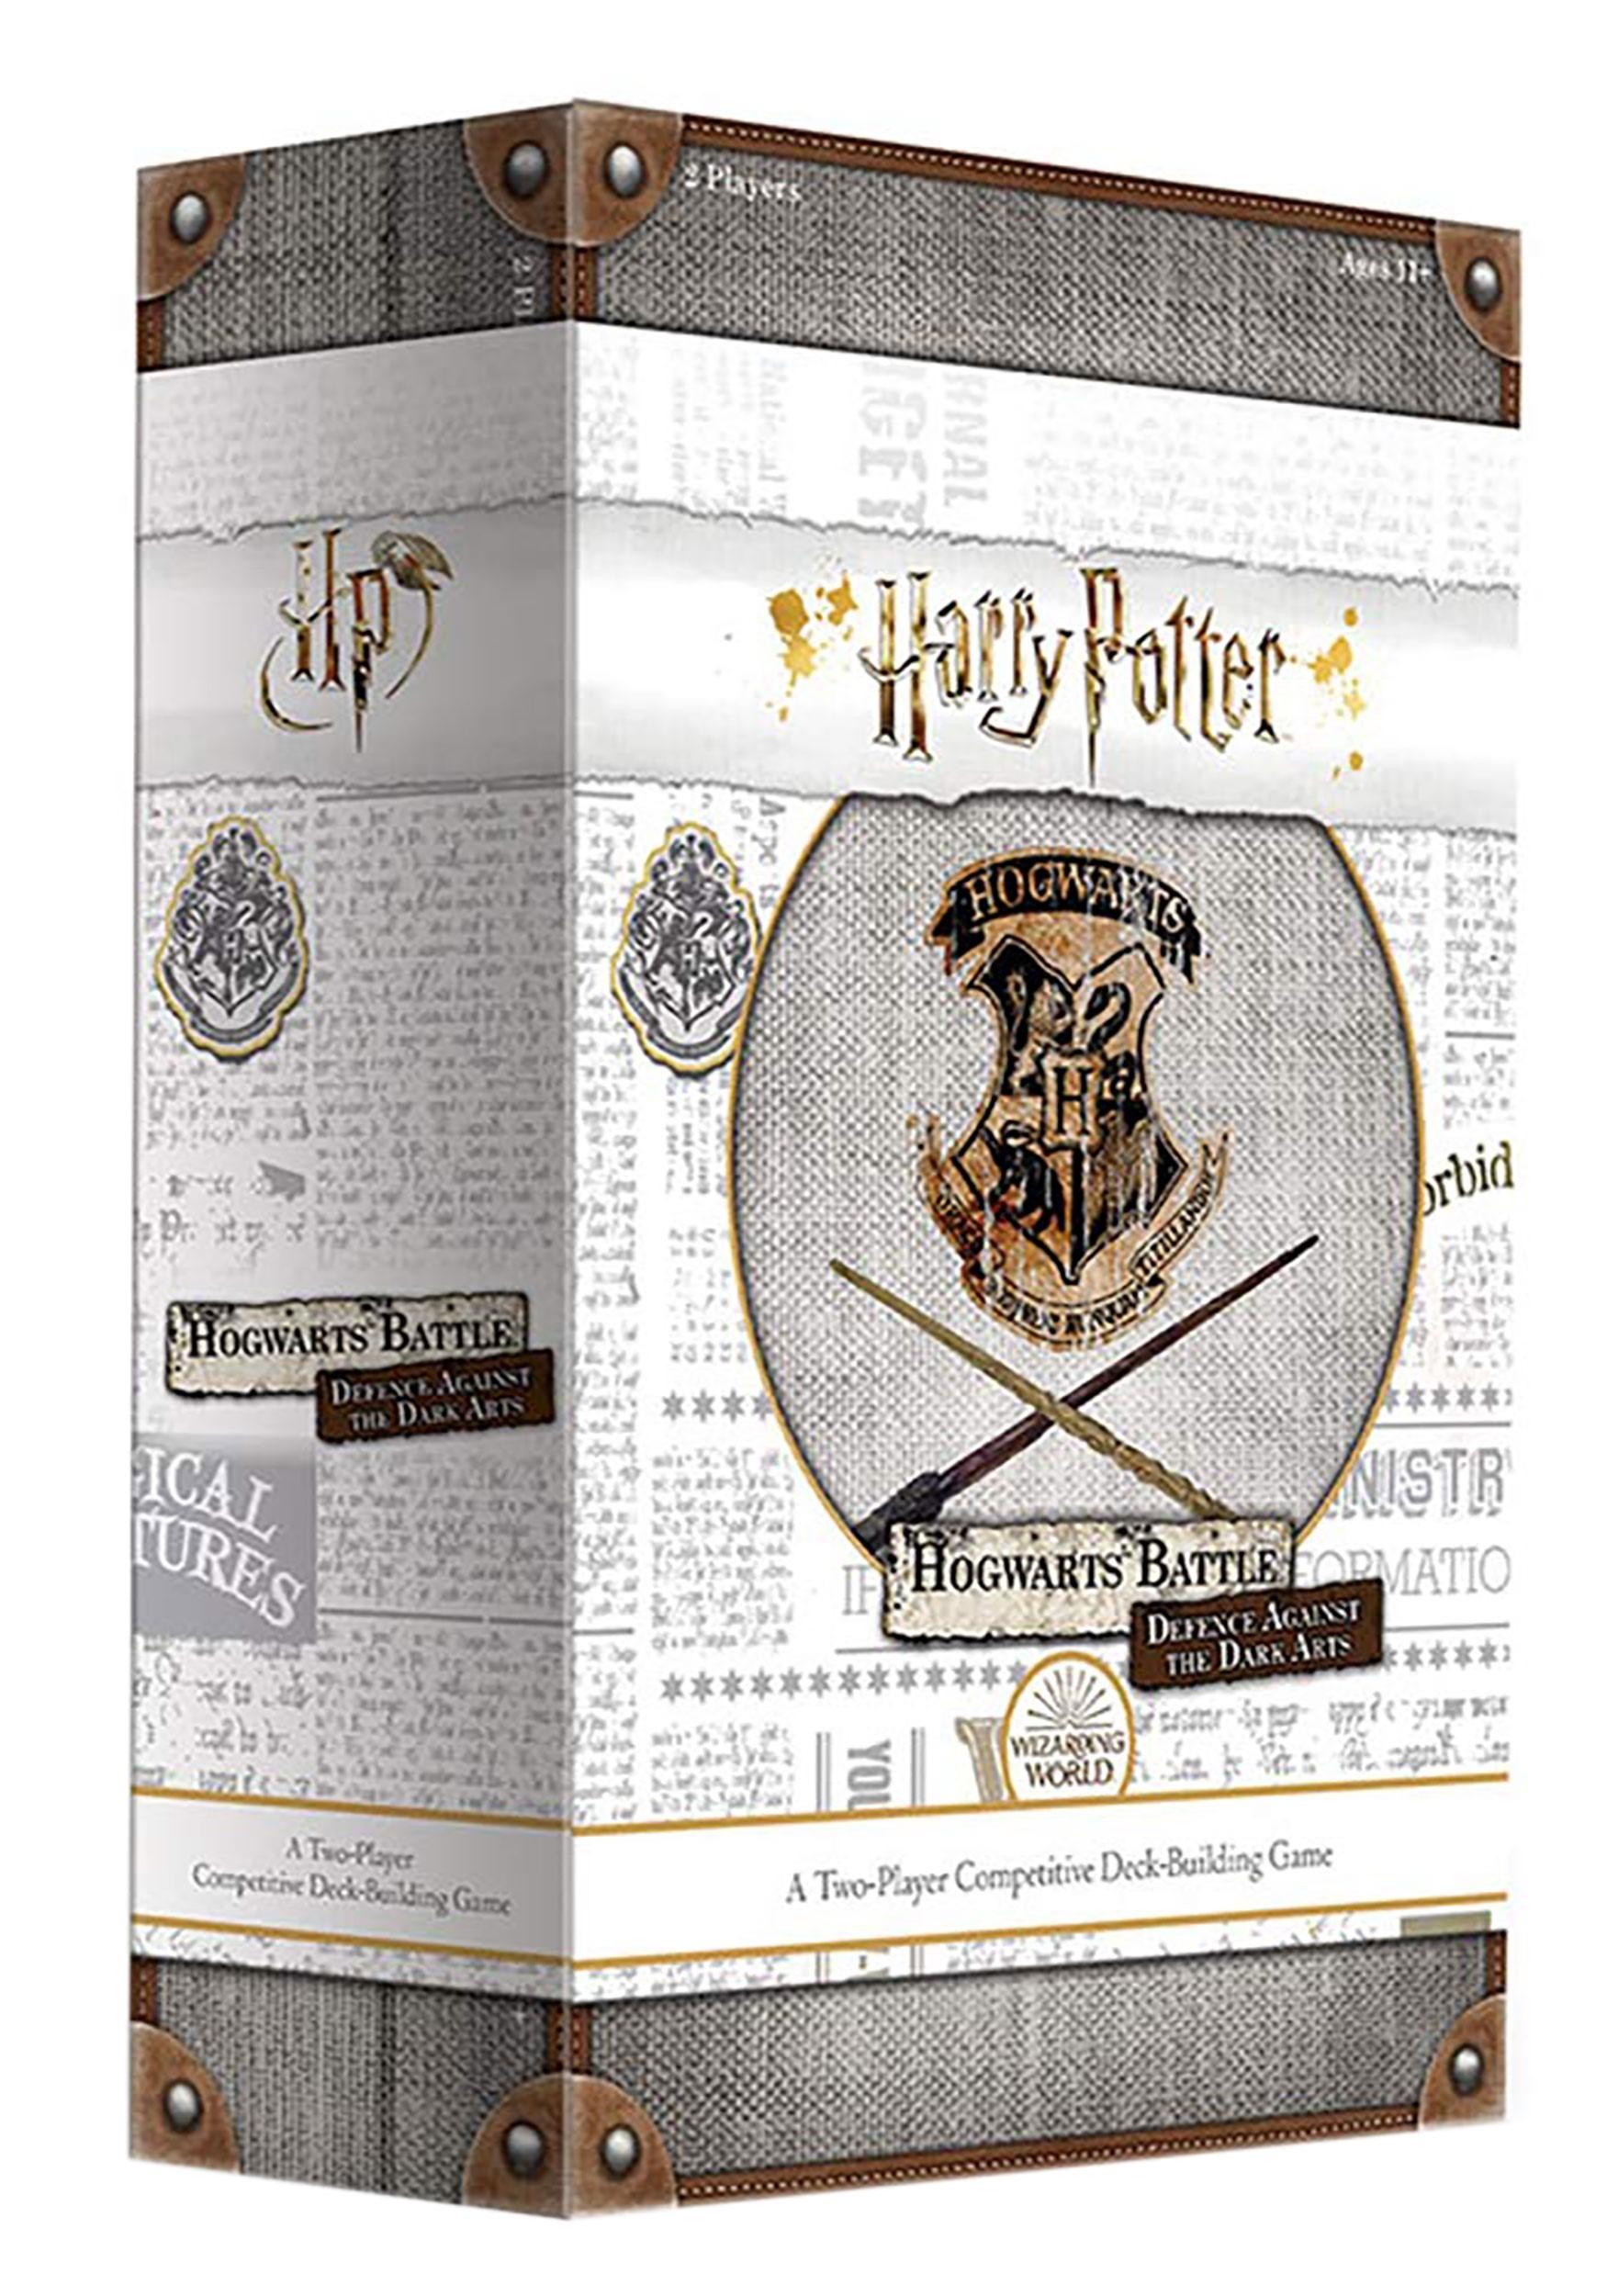 Harry Potter Hogwarts Battle: Dueling Club Edition